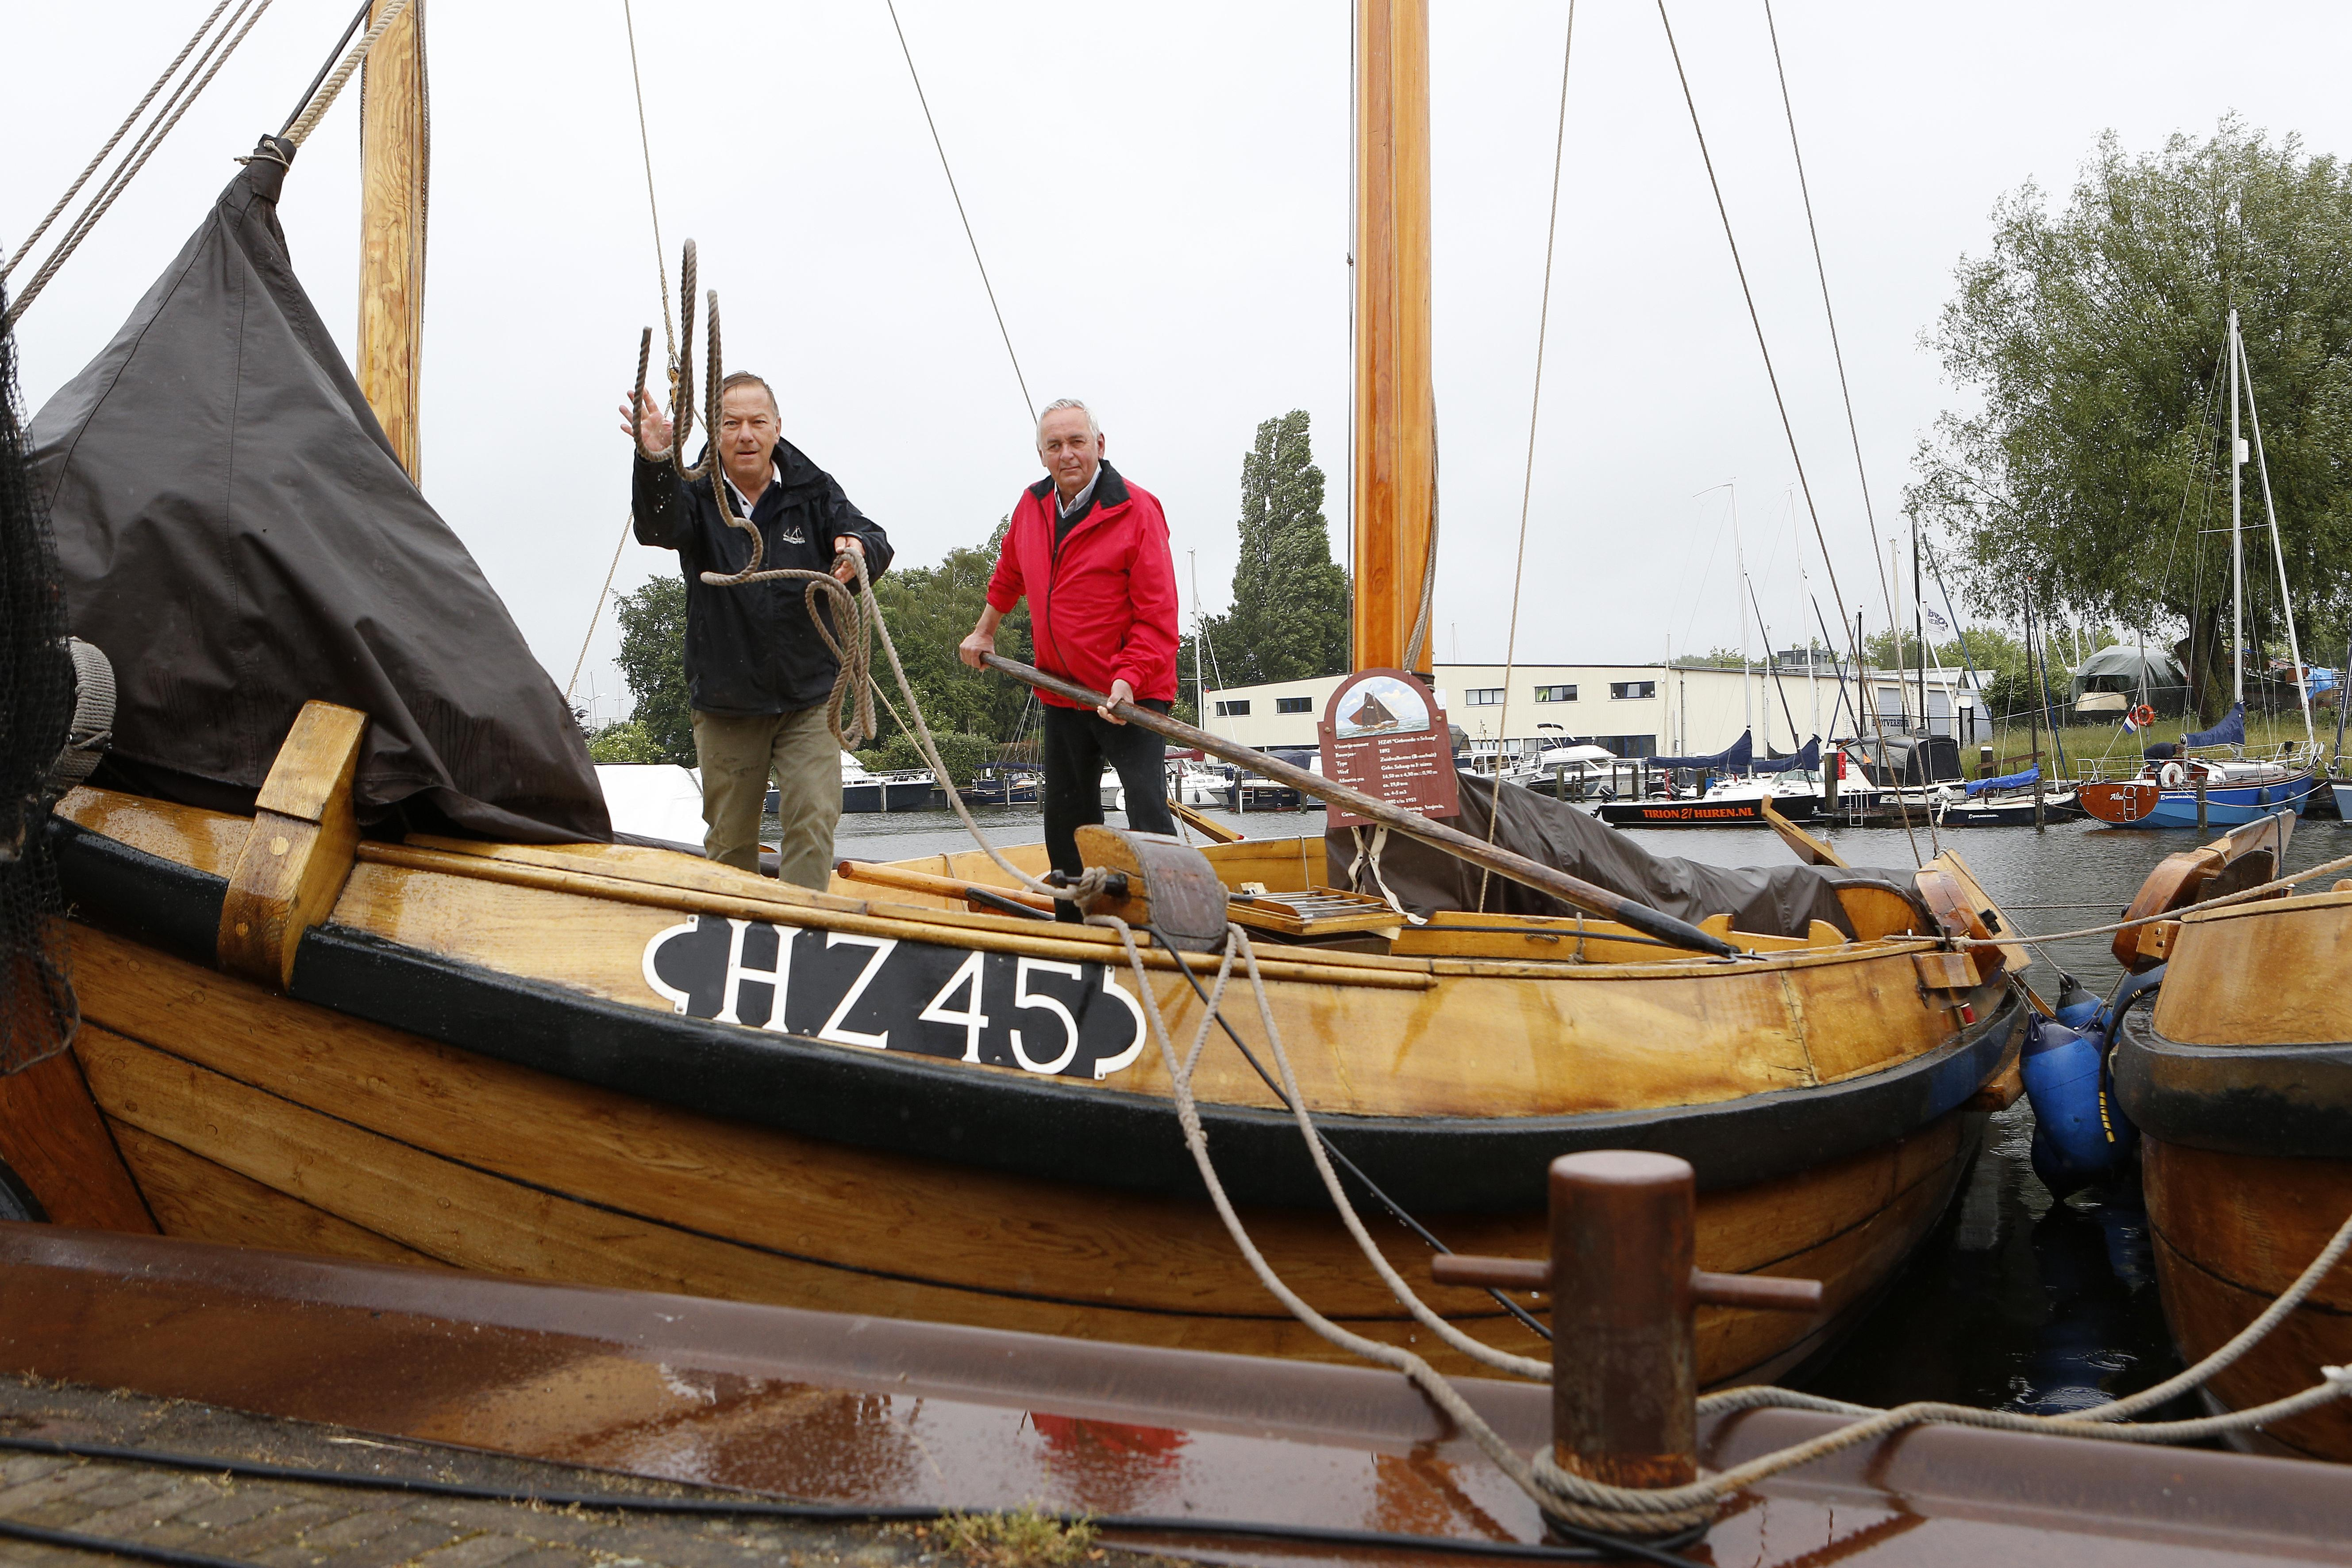 Bruine vloot stevent af op faillissement: 'Alles was afgelast, alles lag stil. Maar gelukkig kunnen we nu weer het water op'